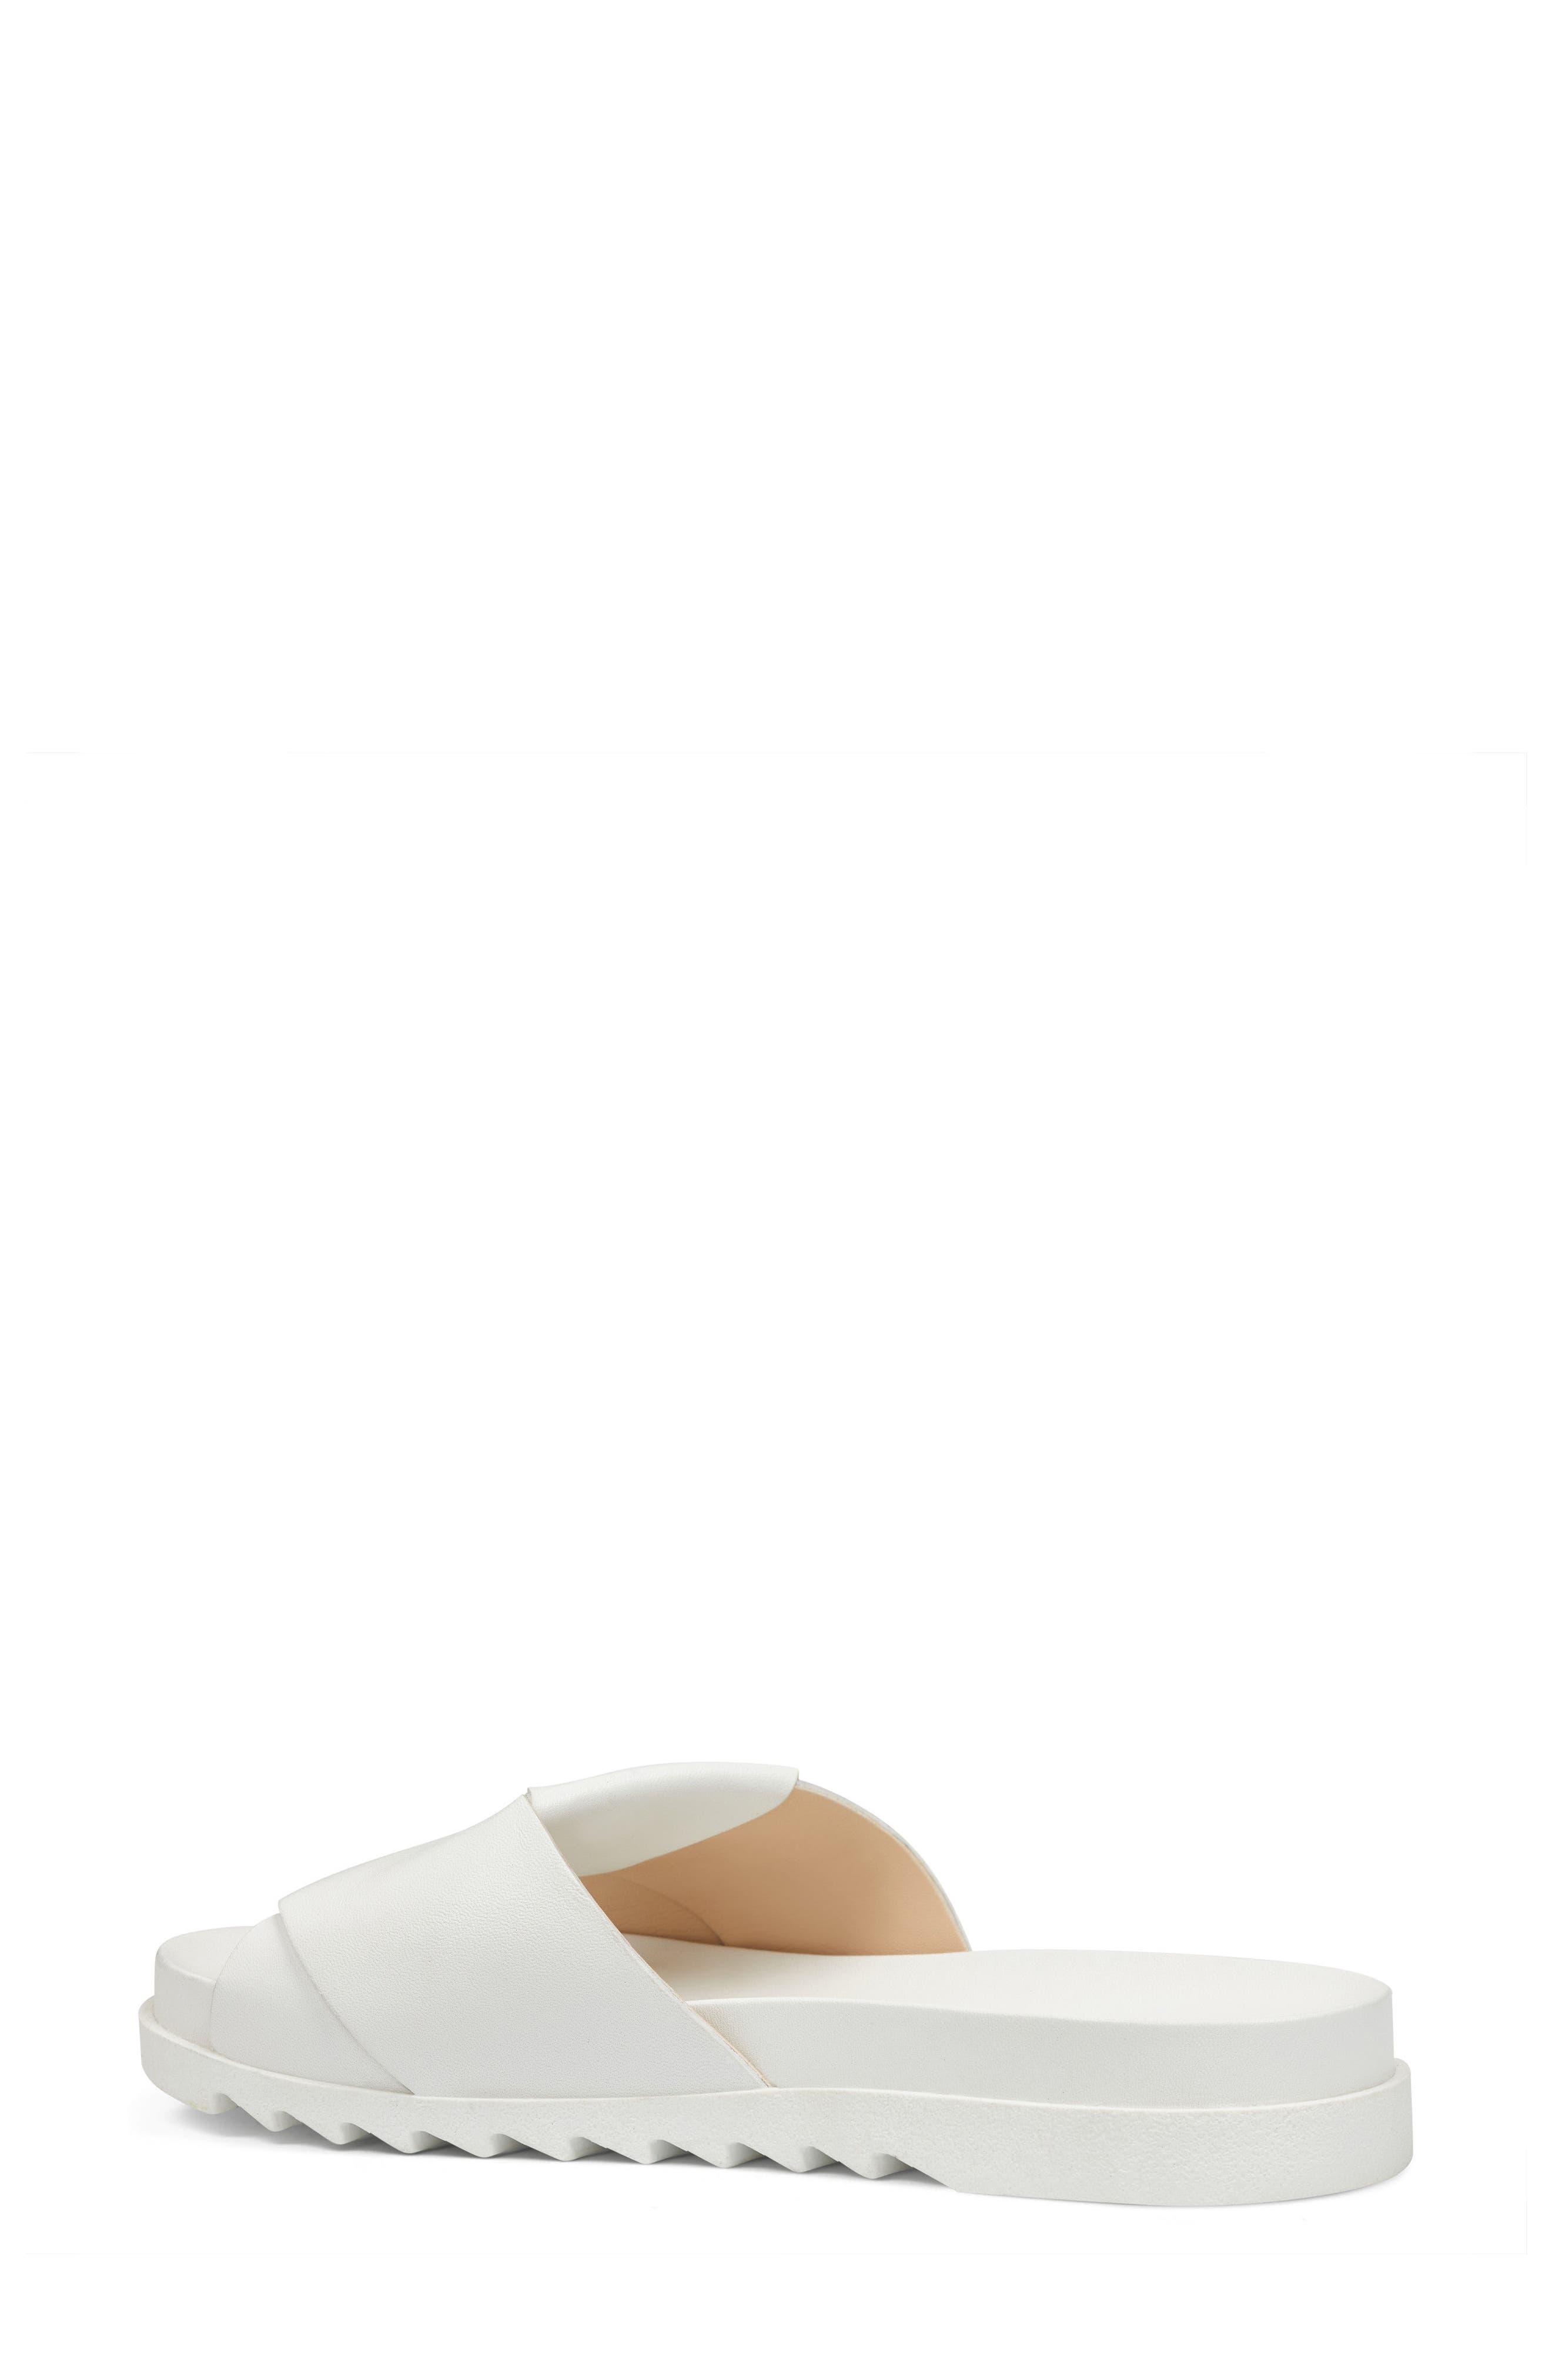 Furaish Slide Sandal,                             Alternate thumbnail 2, color,                             White Leather